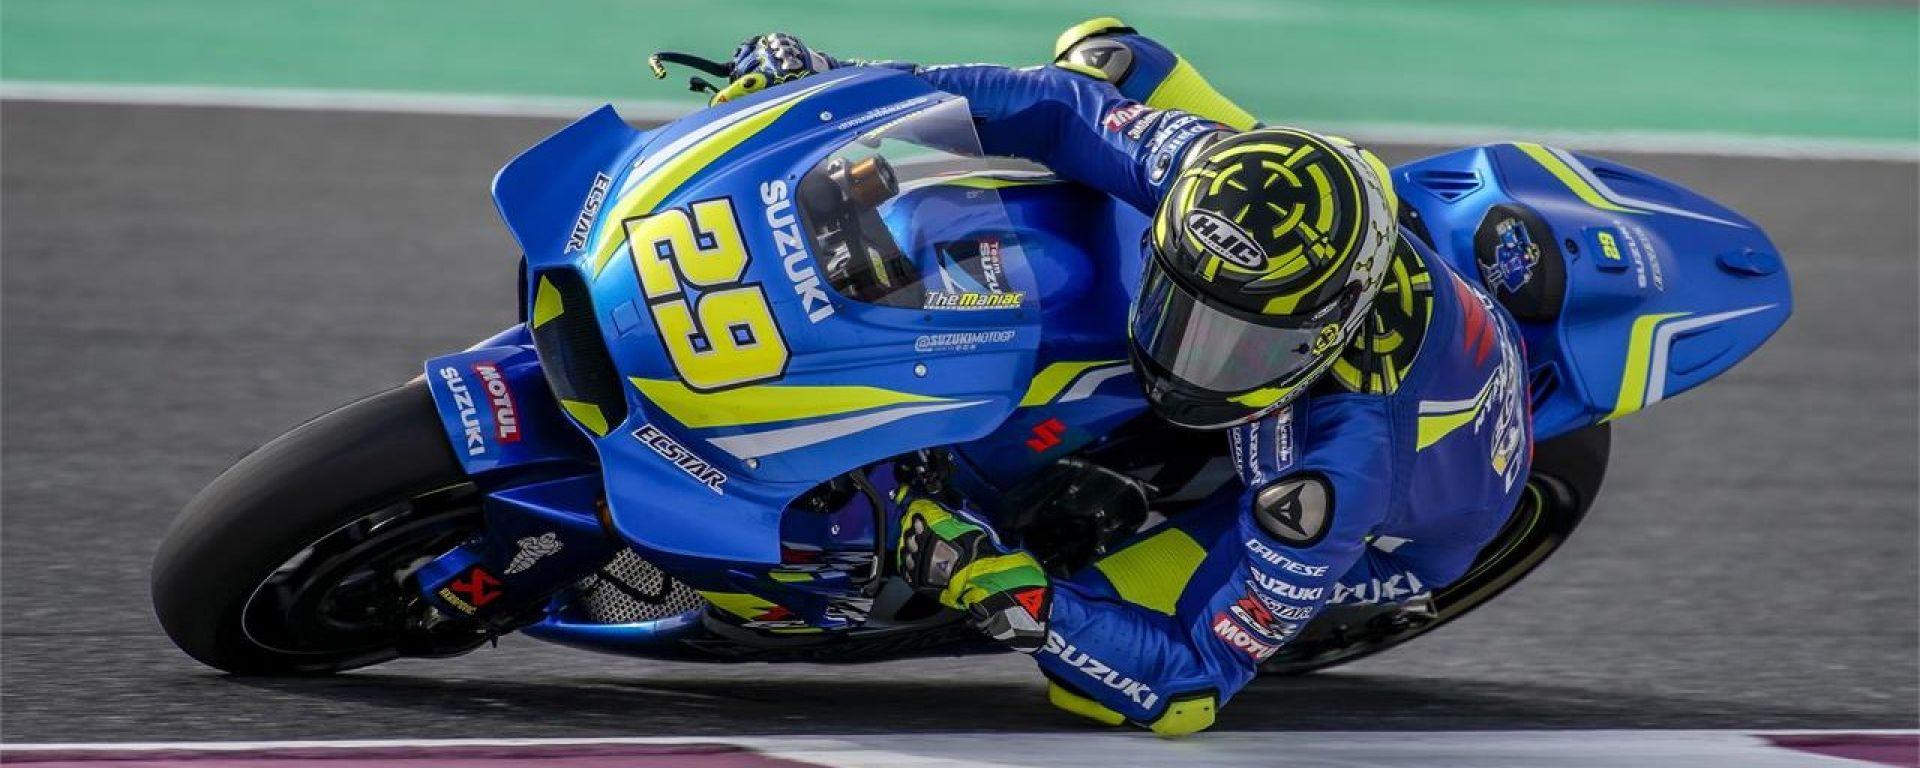 MotoGP Austin 2018, Andrea Iannone